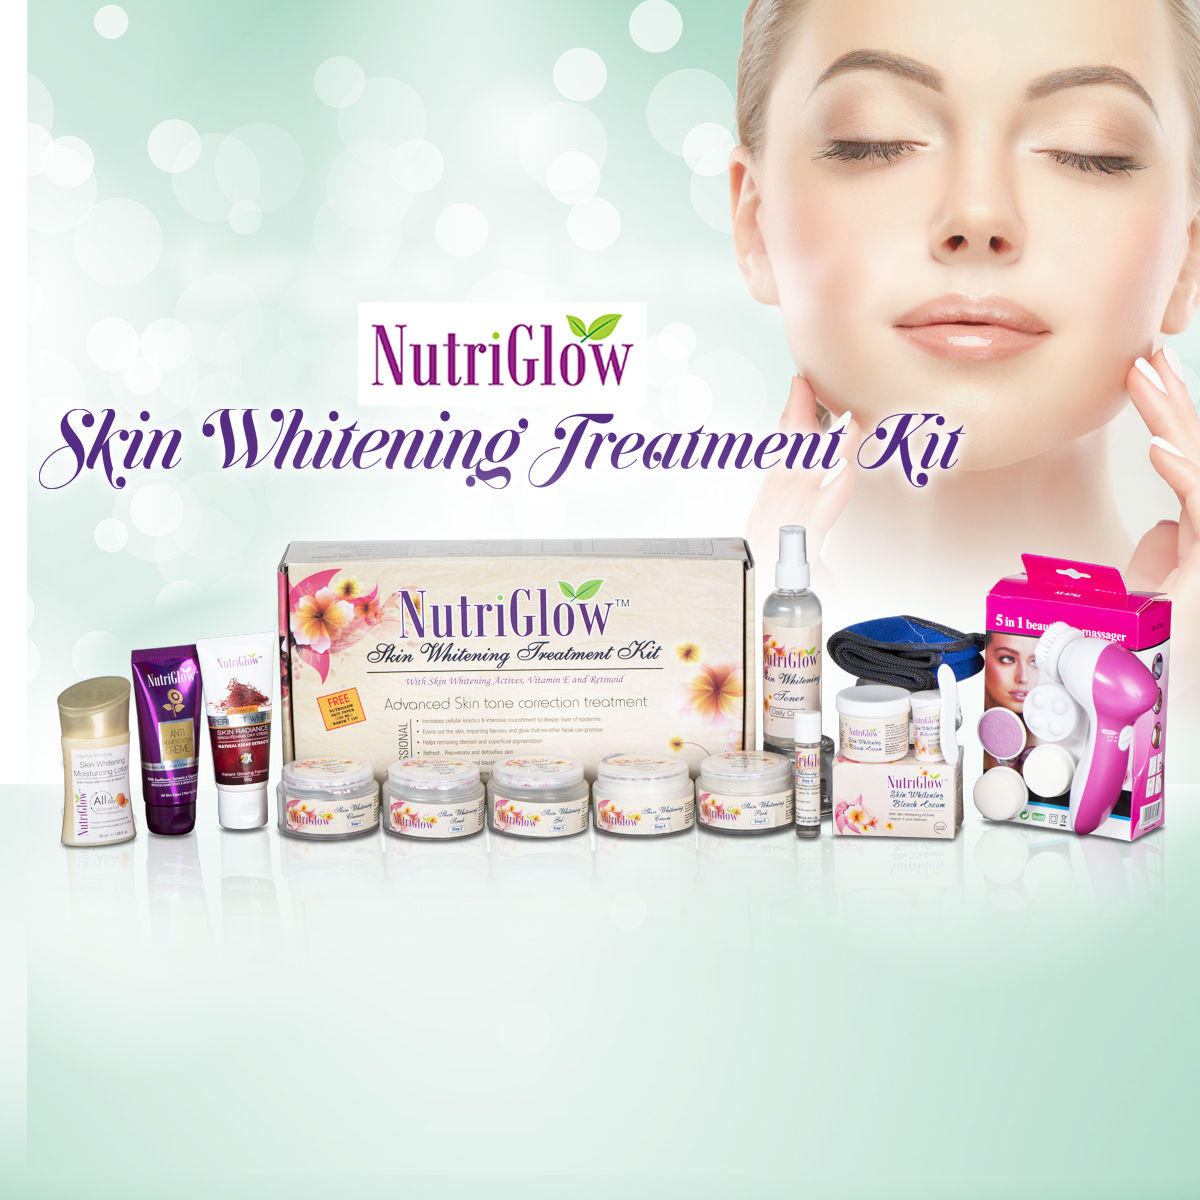 Nutriglow Skin Whitening Treatment Kit